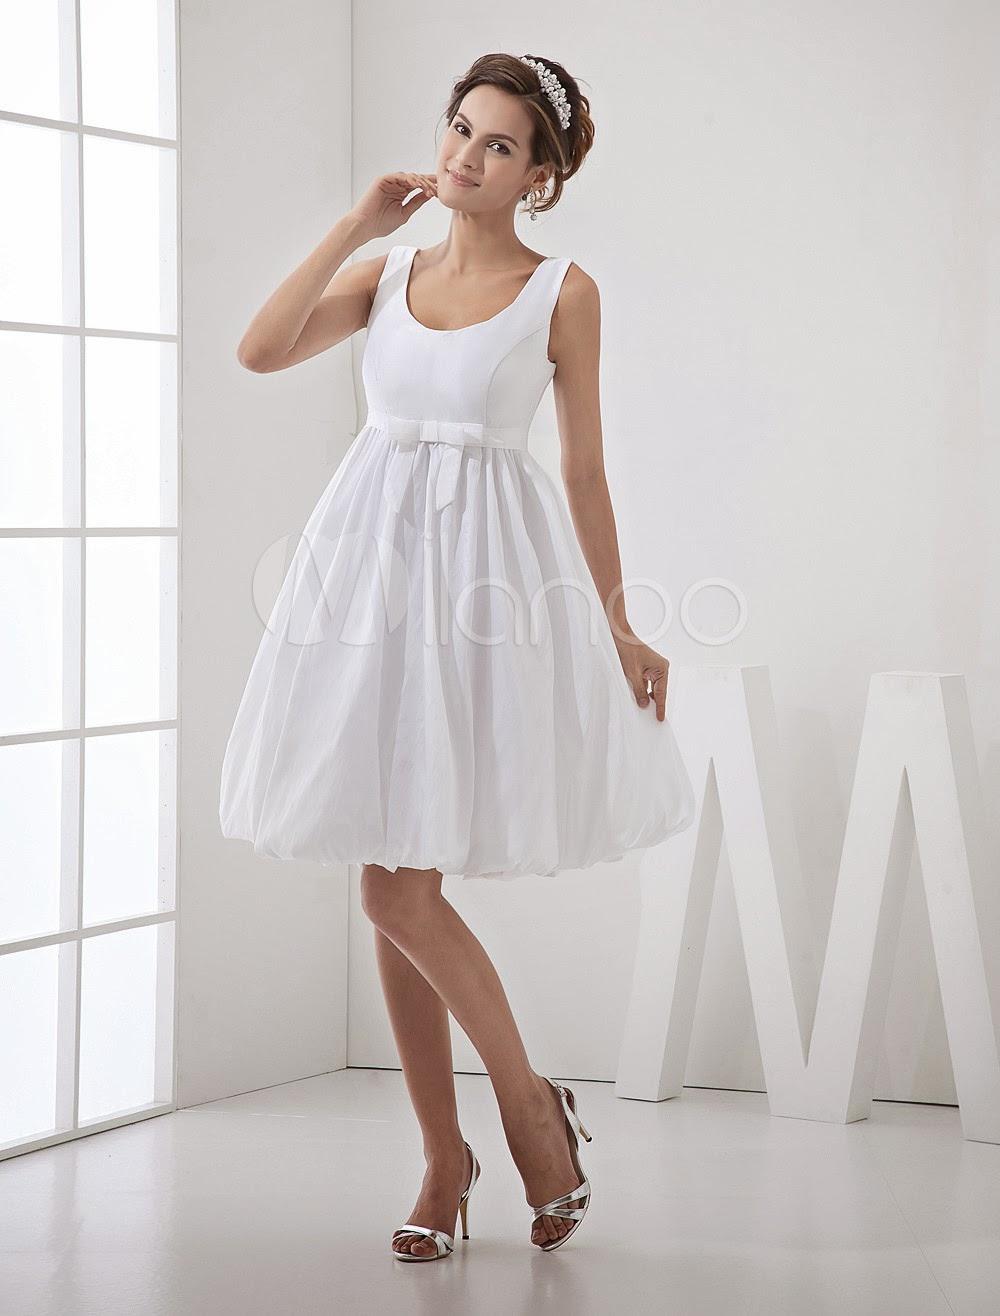 China Wholesale Dresses - Chic White Taffeta Jewel Neck Bow A-line Sleeveless Bridal Wedding Dress